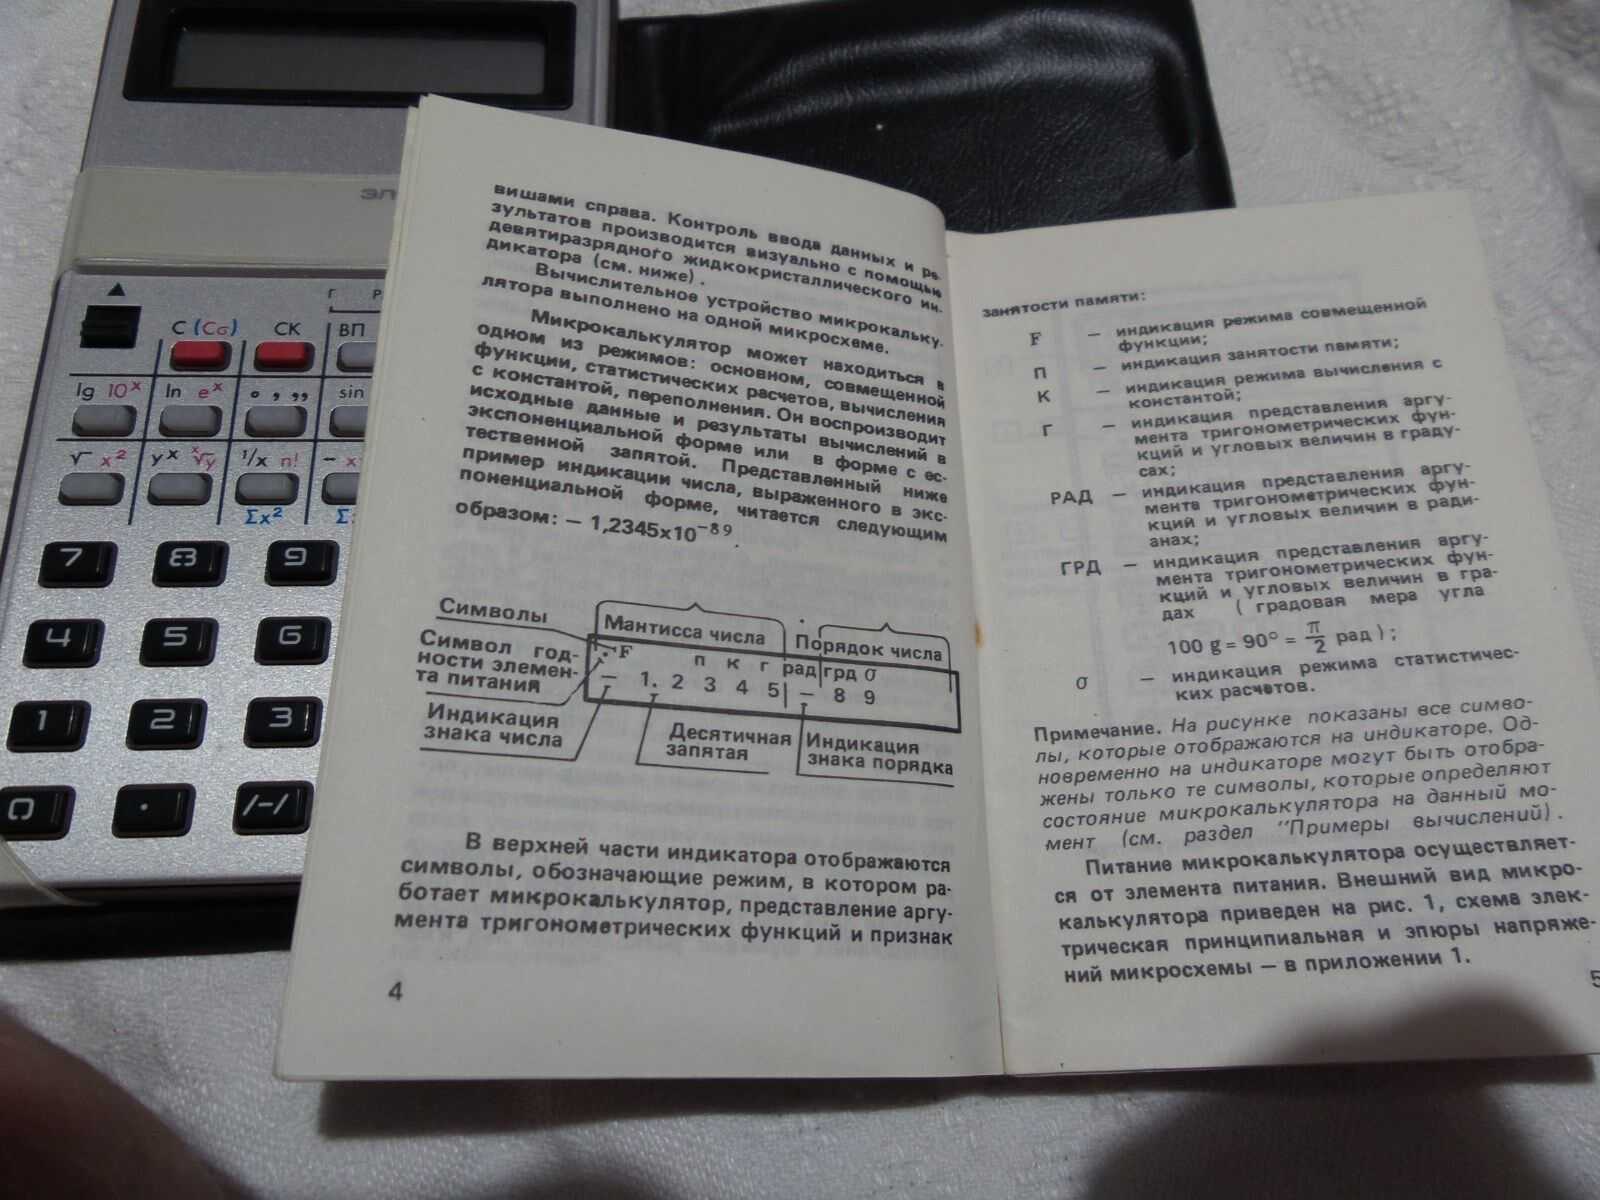 ELEKTRONIKA MK51 (MK 51) VINTAGE SOVIET CALCULATOR    8438